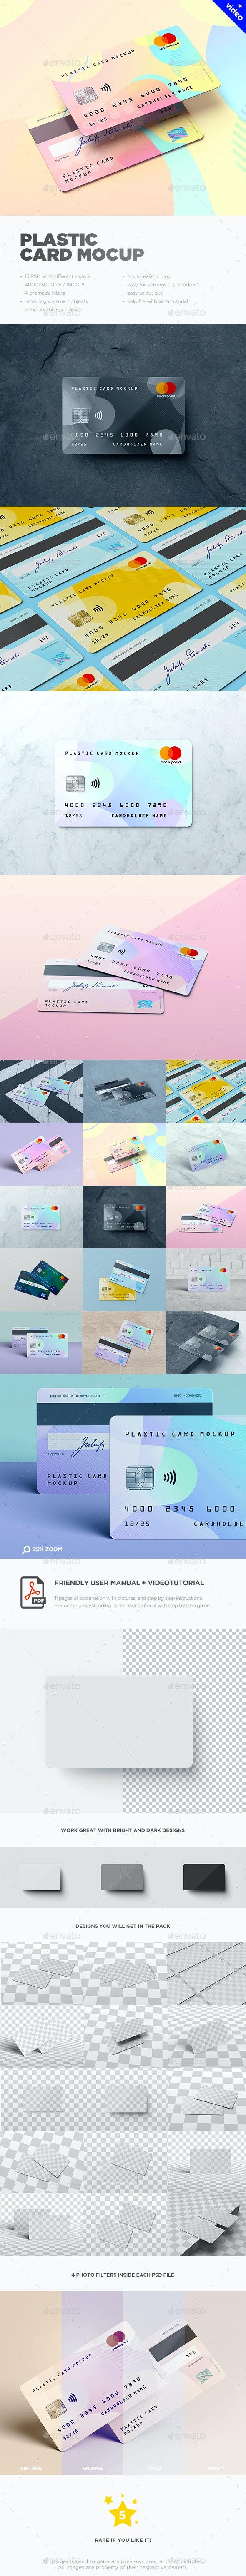 Plastic Card / Bank Card MockUp - Business Cards Print